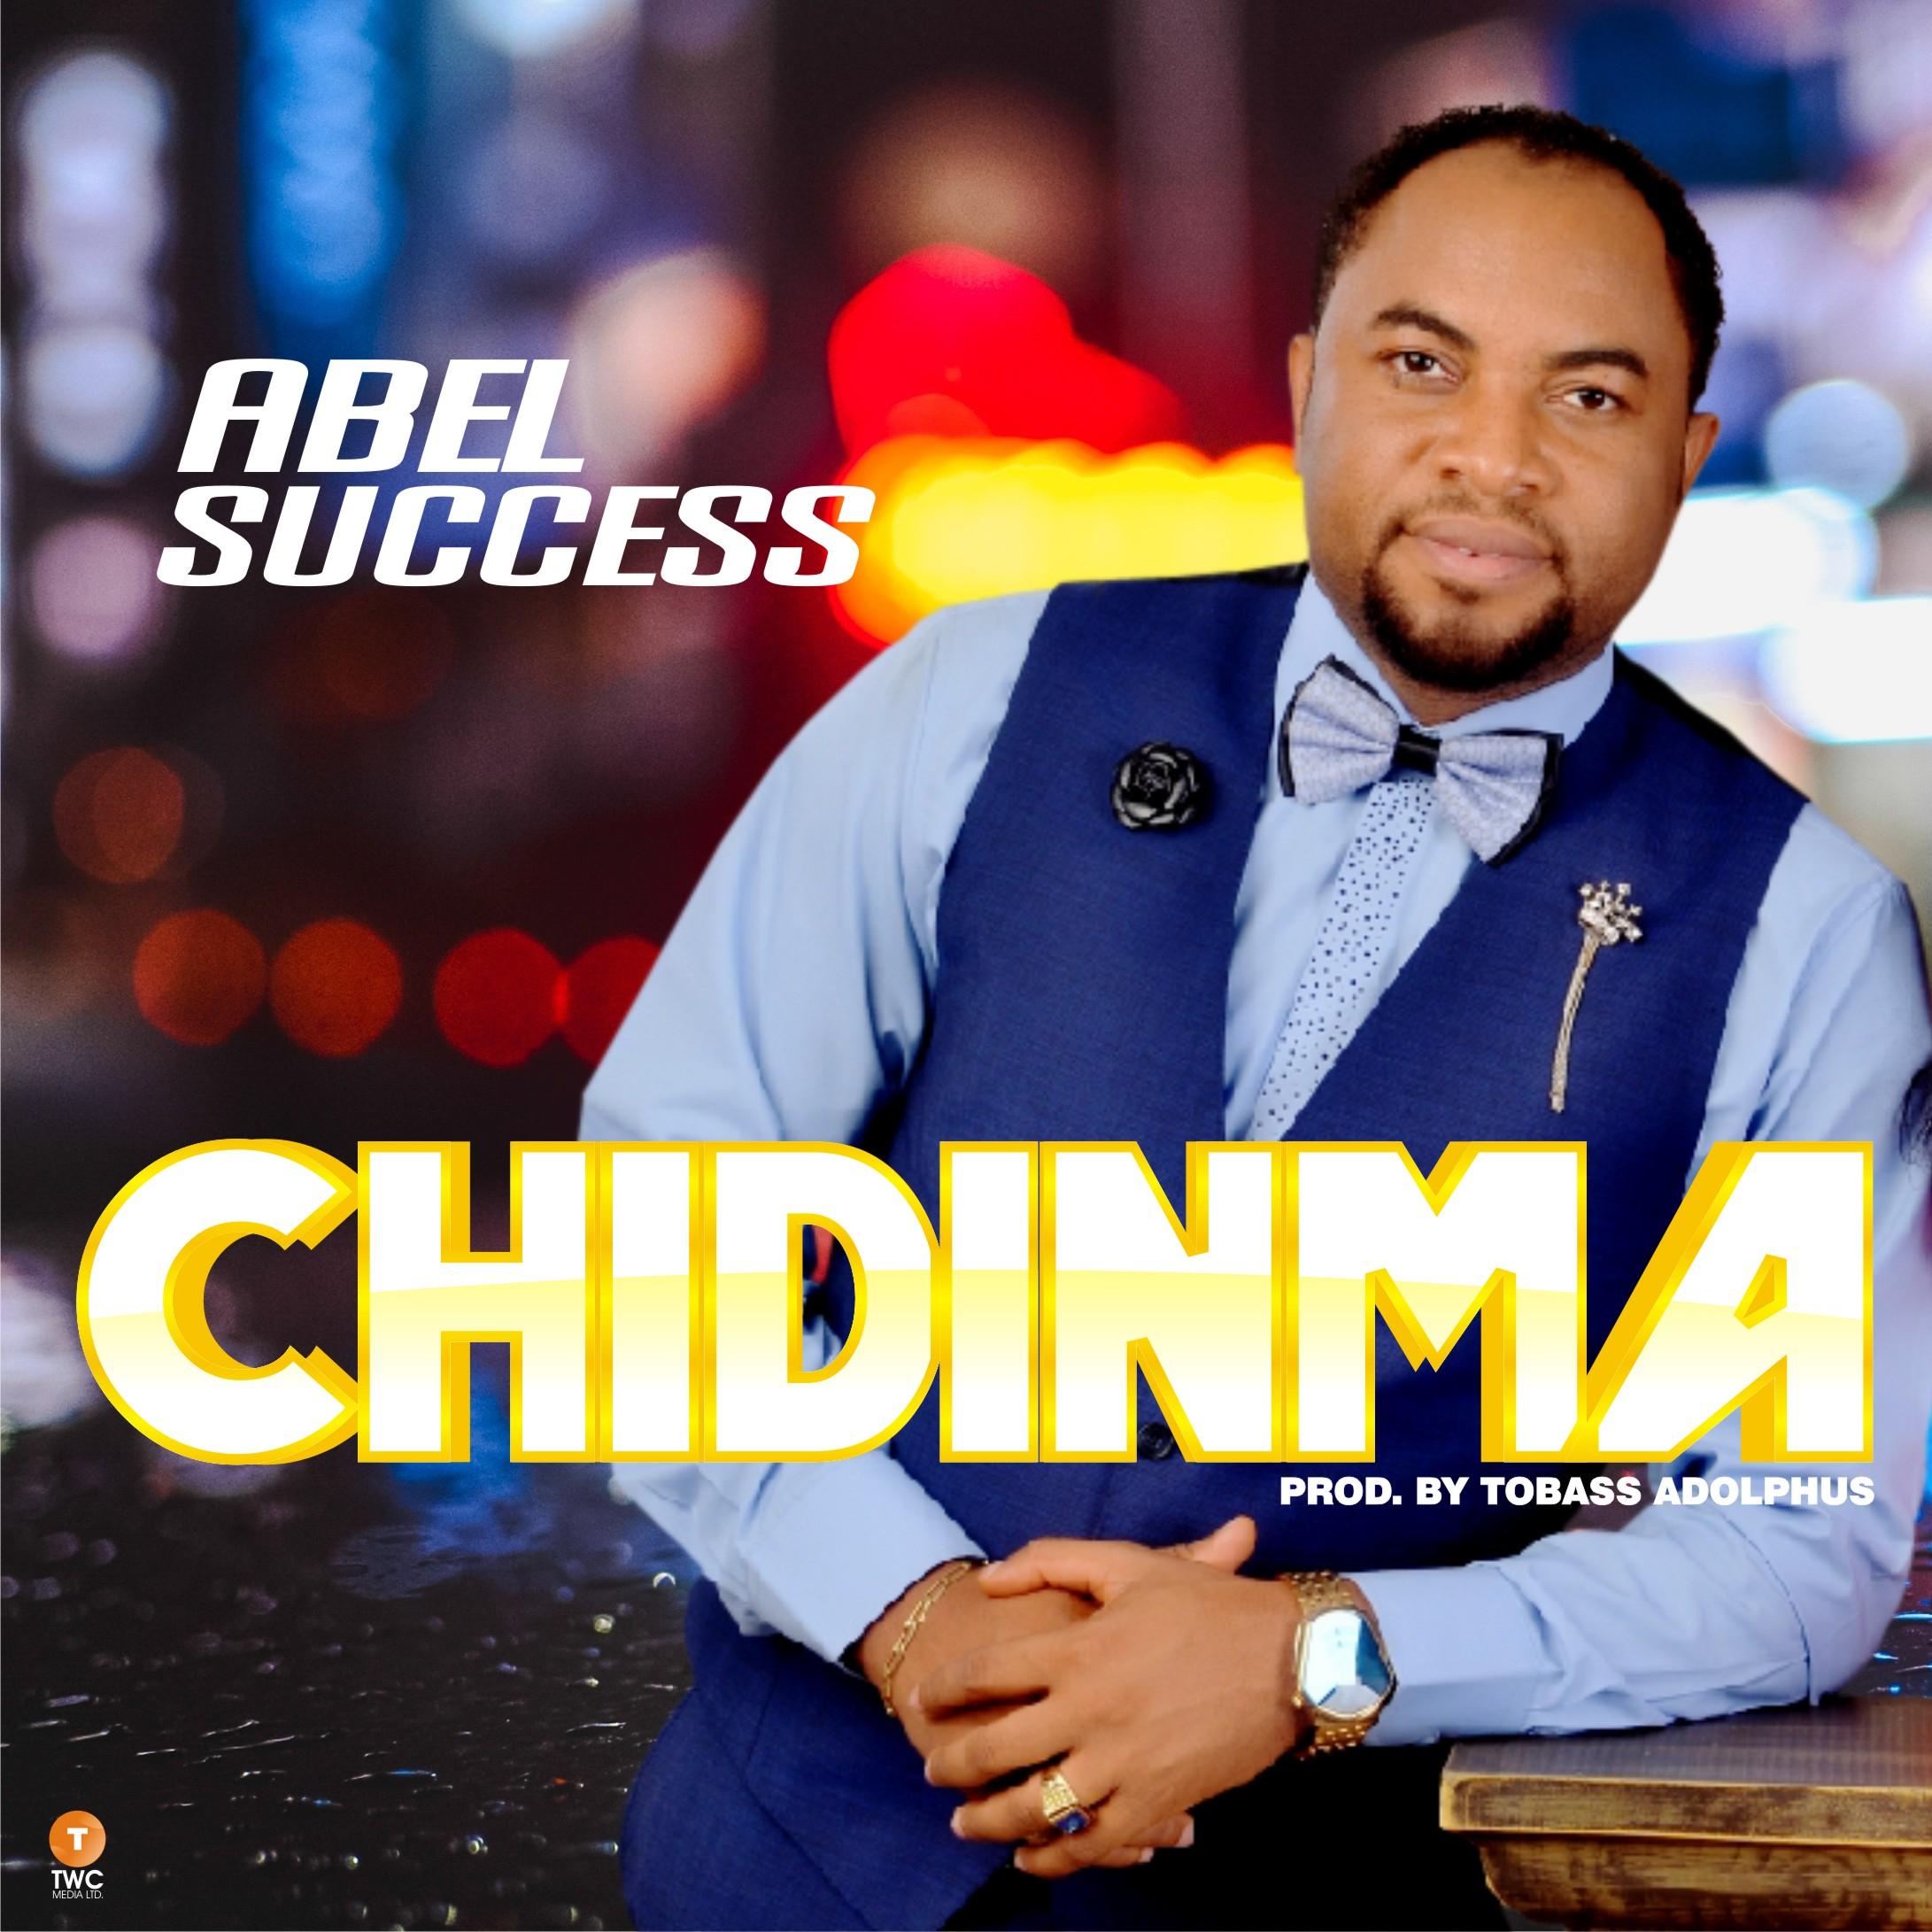 Abel Success - CHIDINMA (Free Mp3 Download)